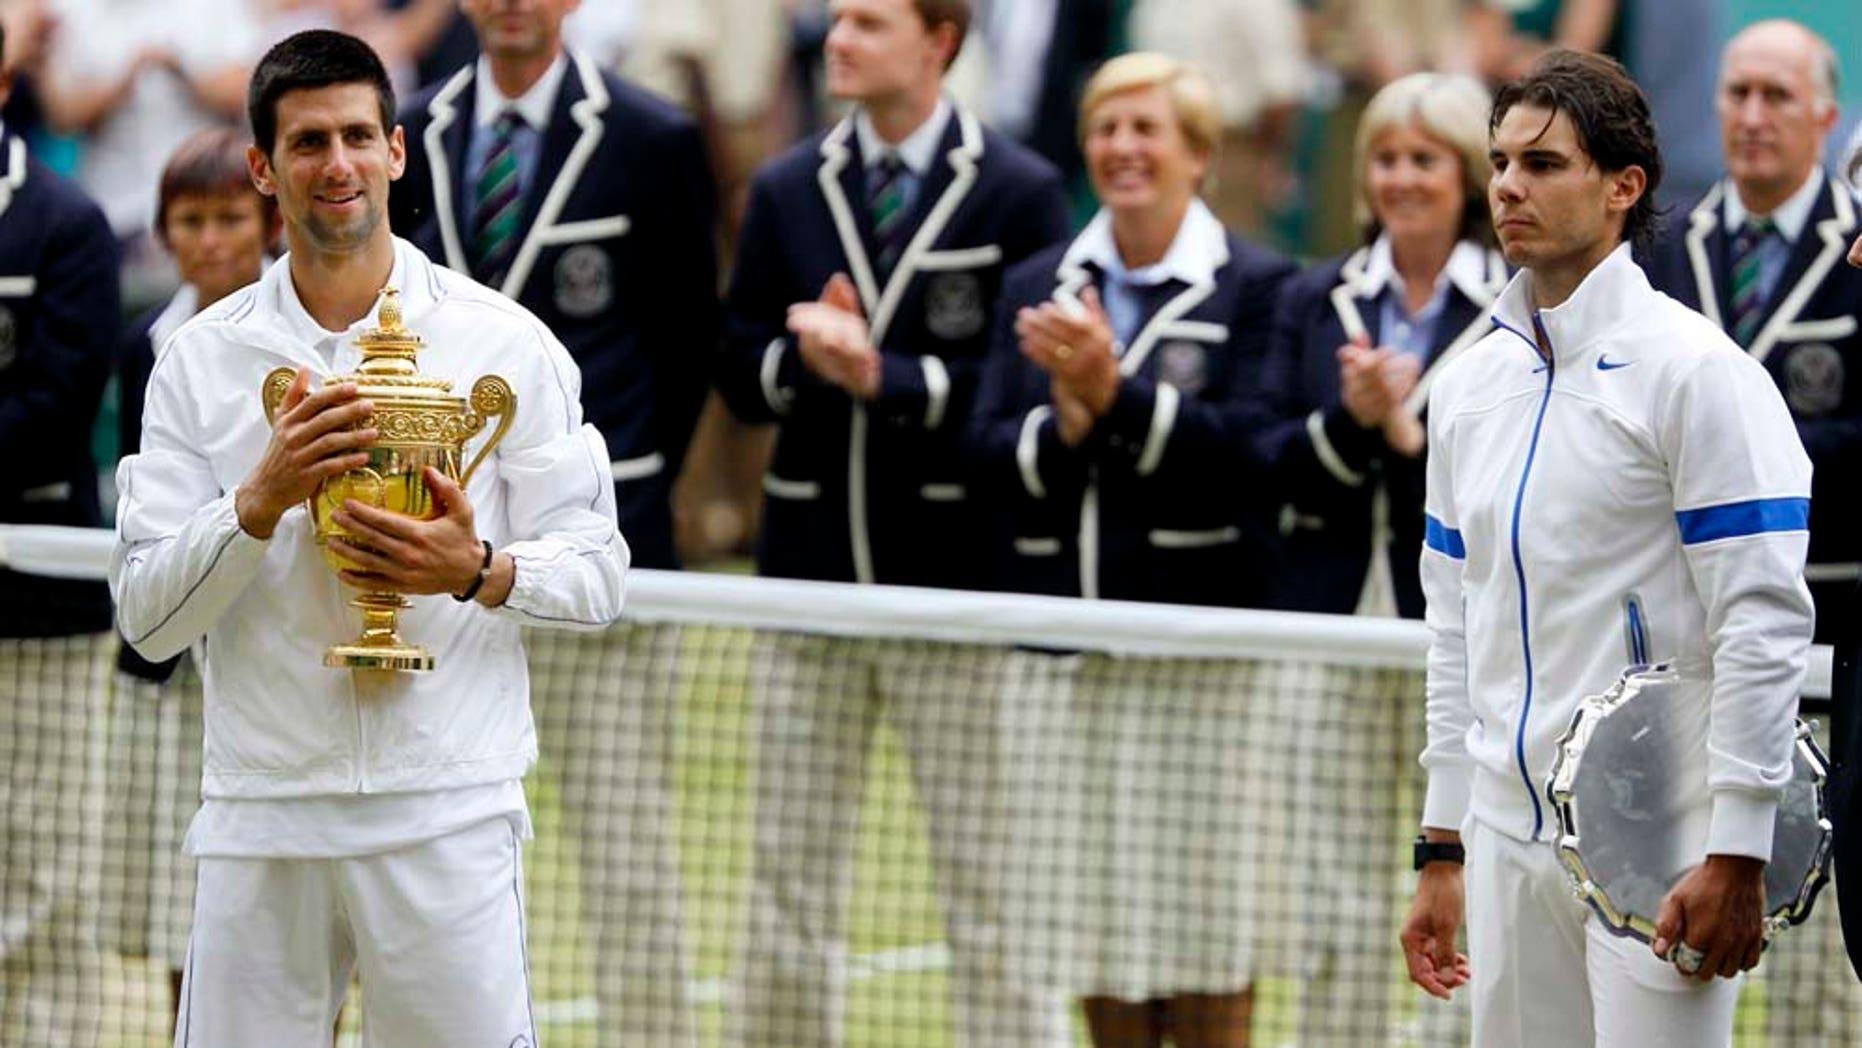 Rafael Nadal Loses Wimbledon Final To Novak Djokovic Fox News